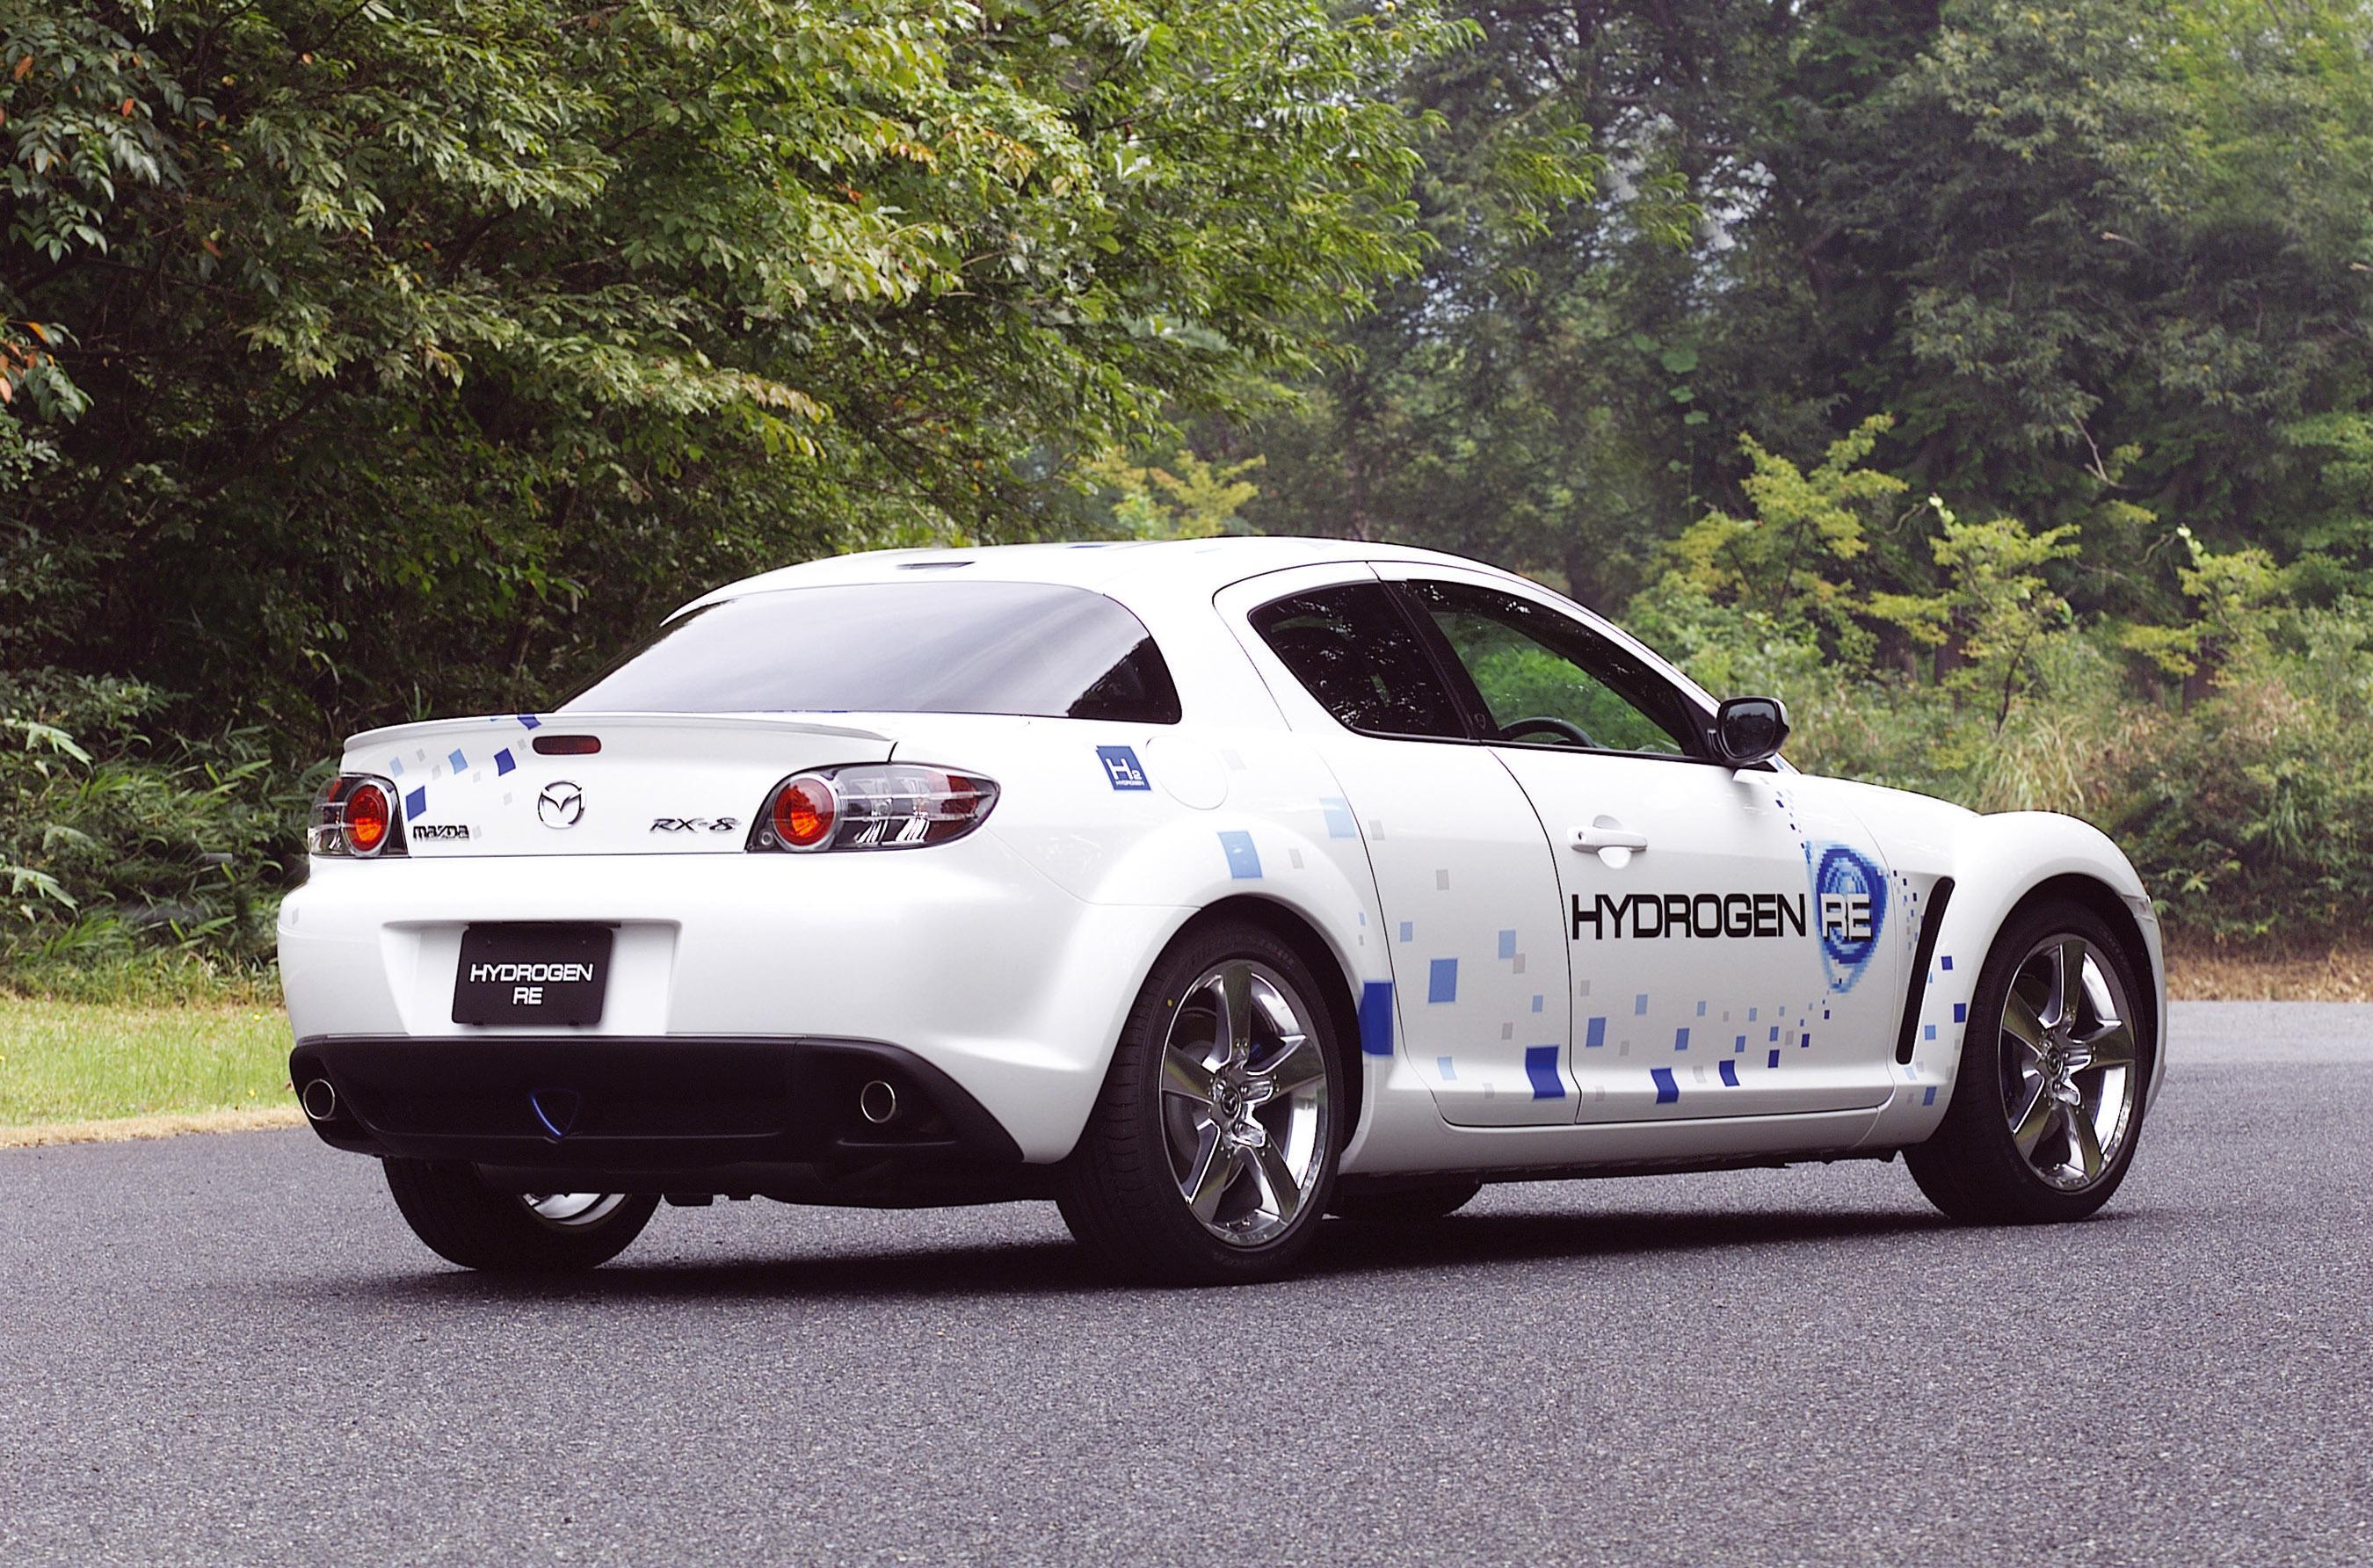 2003 Mazda RX-8 Hydrogen Concept - HD Pictures @ carsinvasion.com